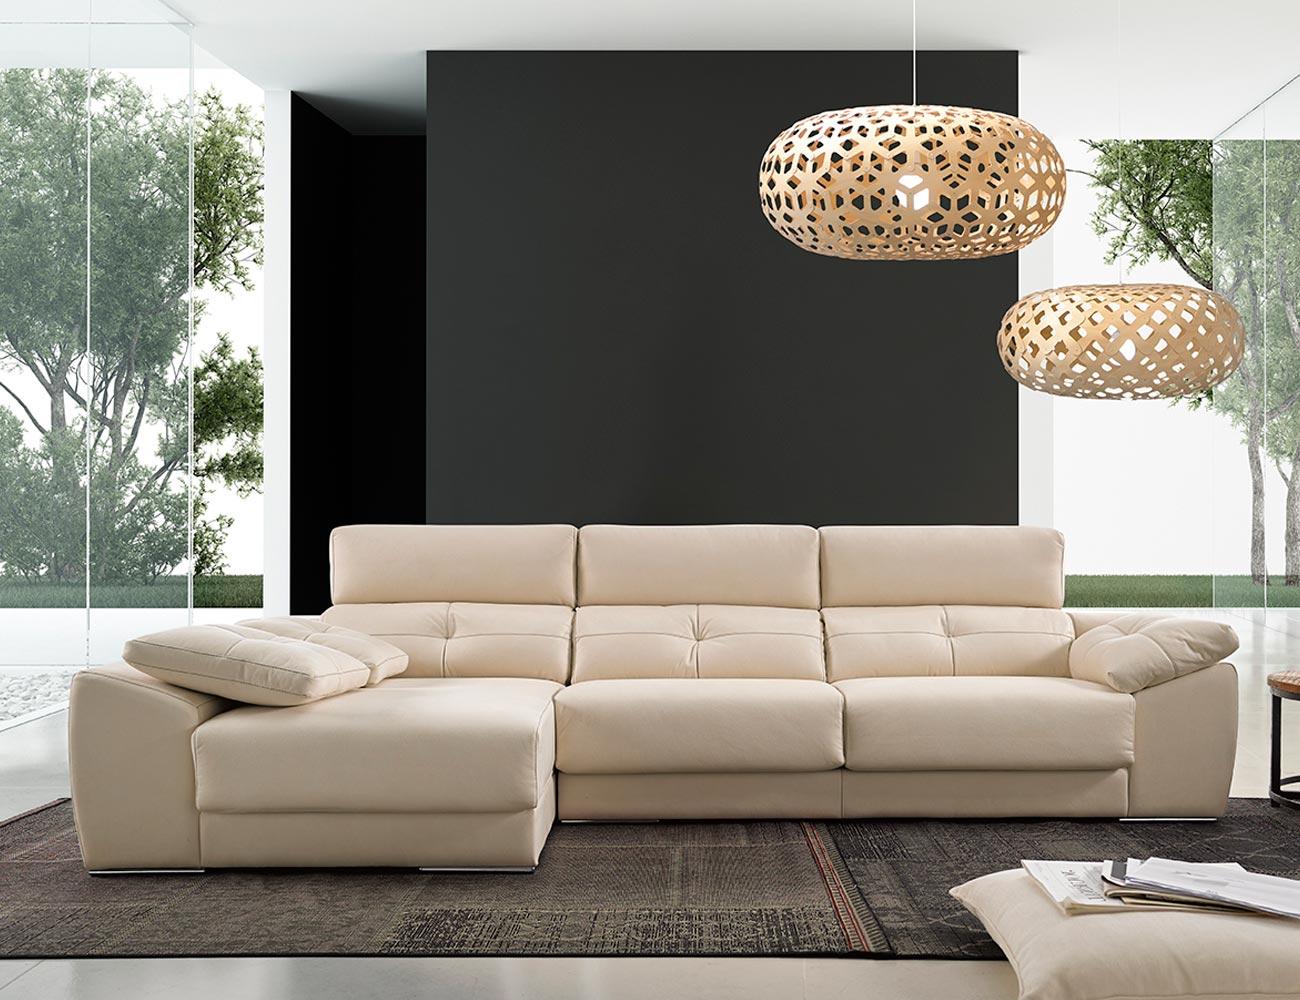 Sofa chaiselongue moderno chaiselongue losa arcon puf